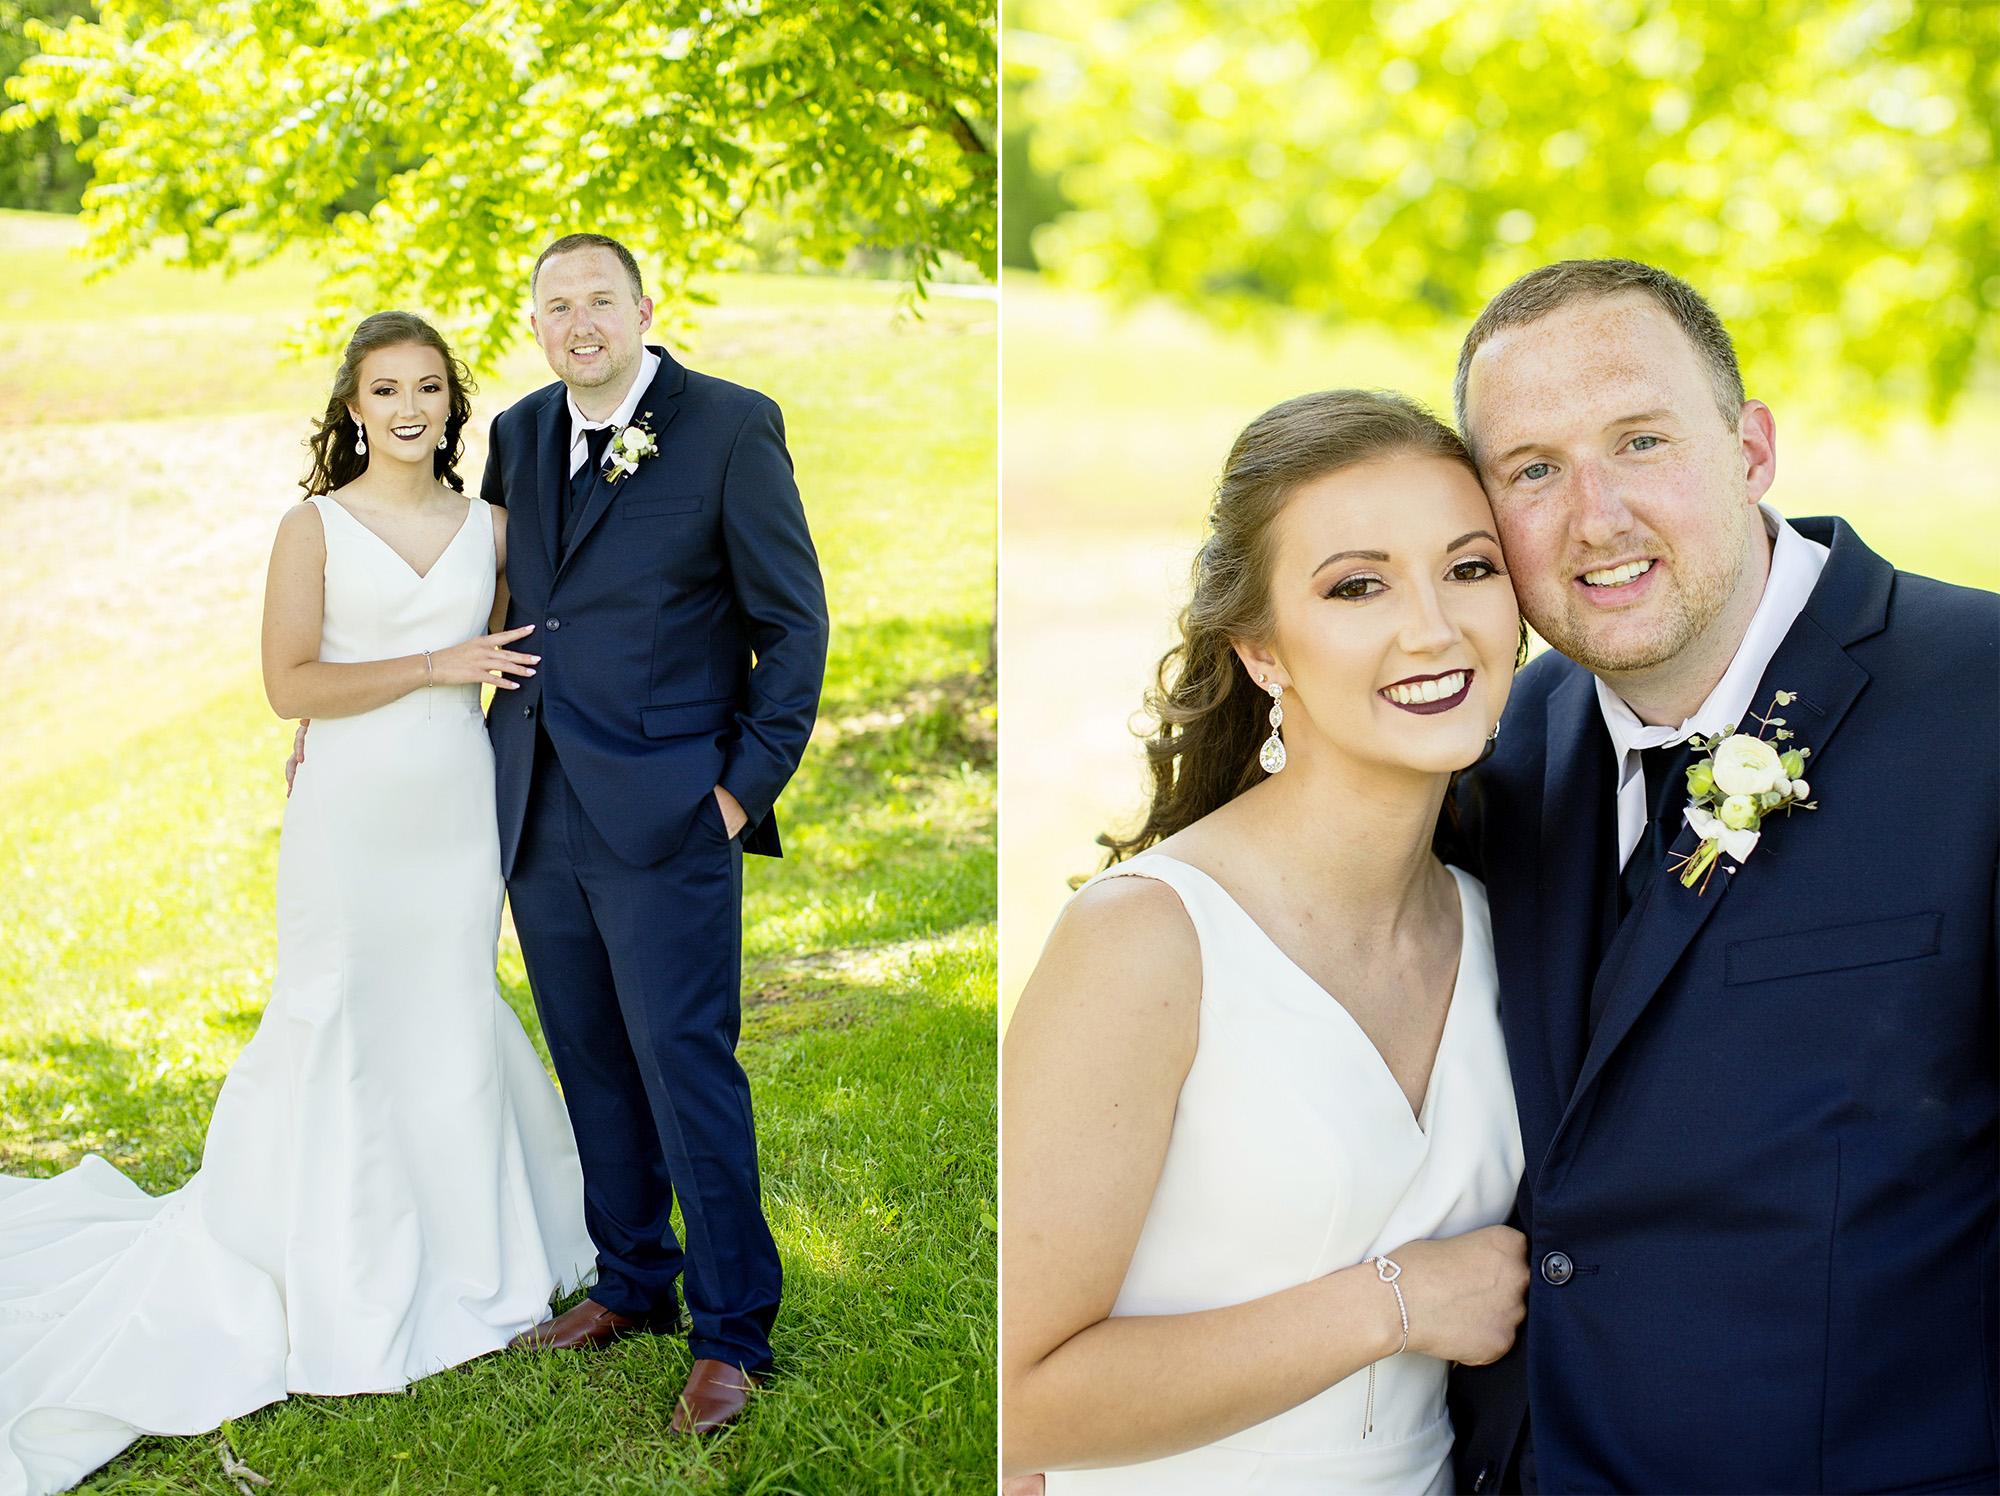 Seriously_Sabrina_Photography_Red_River_Gorge_Wedding_Barn_Robinson33.jpg